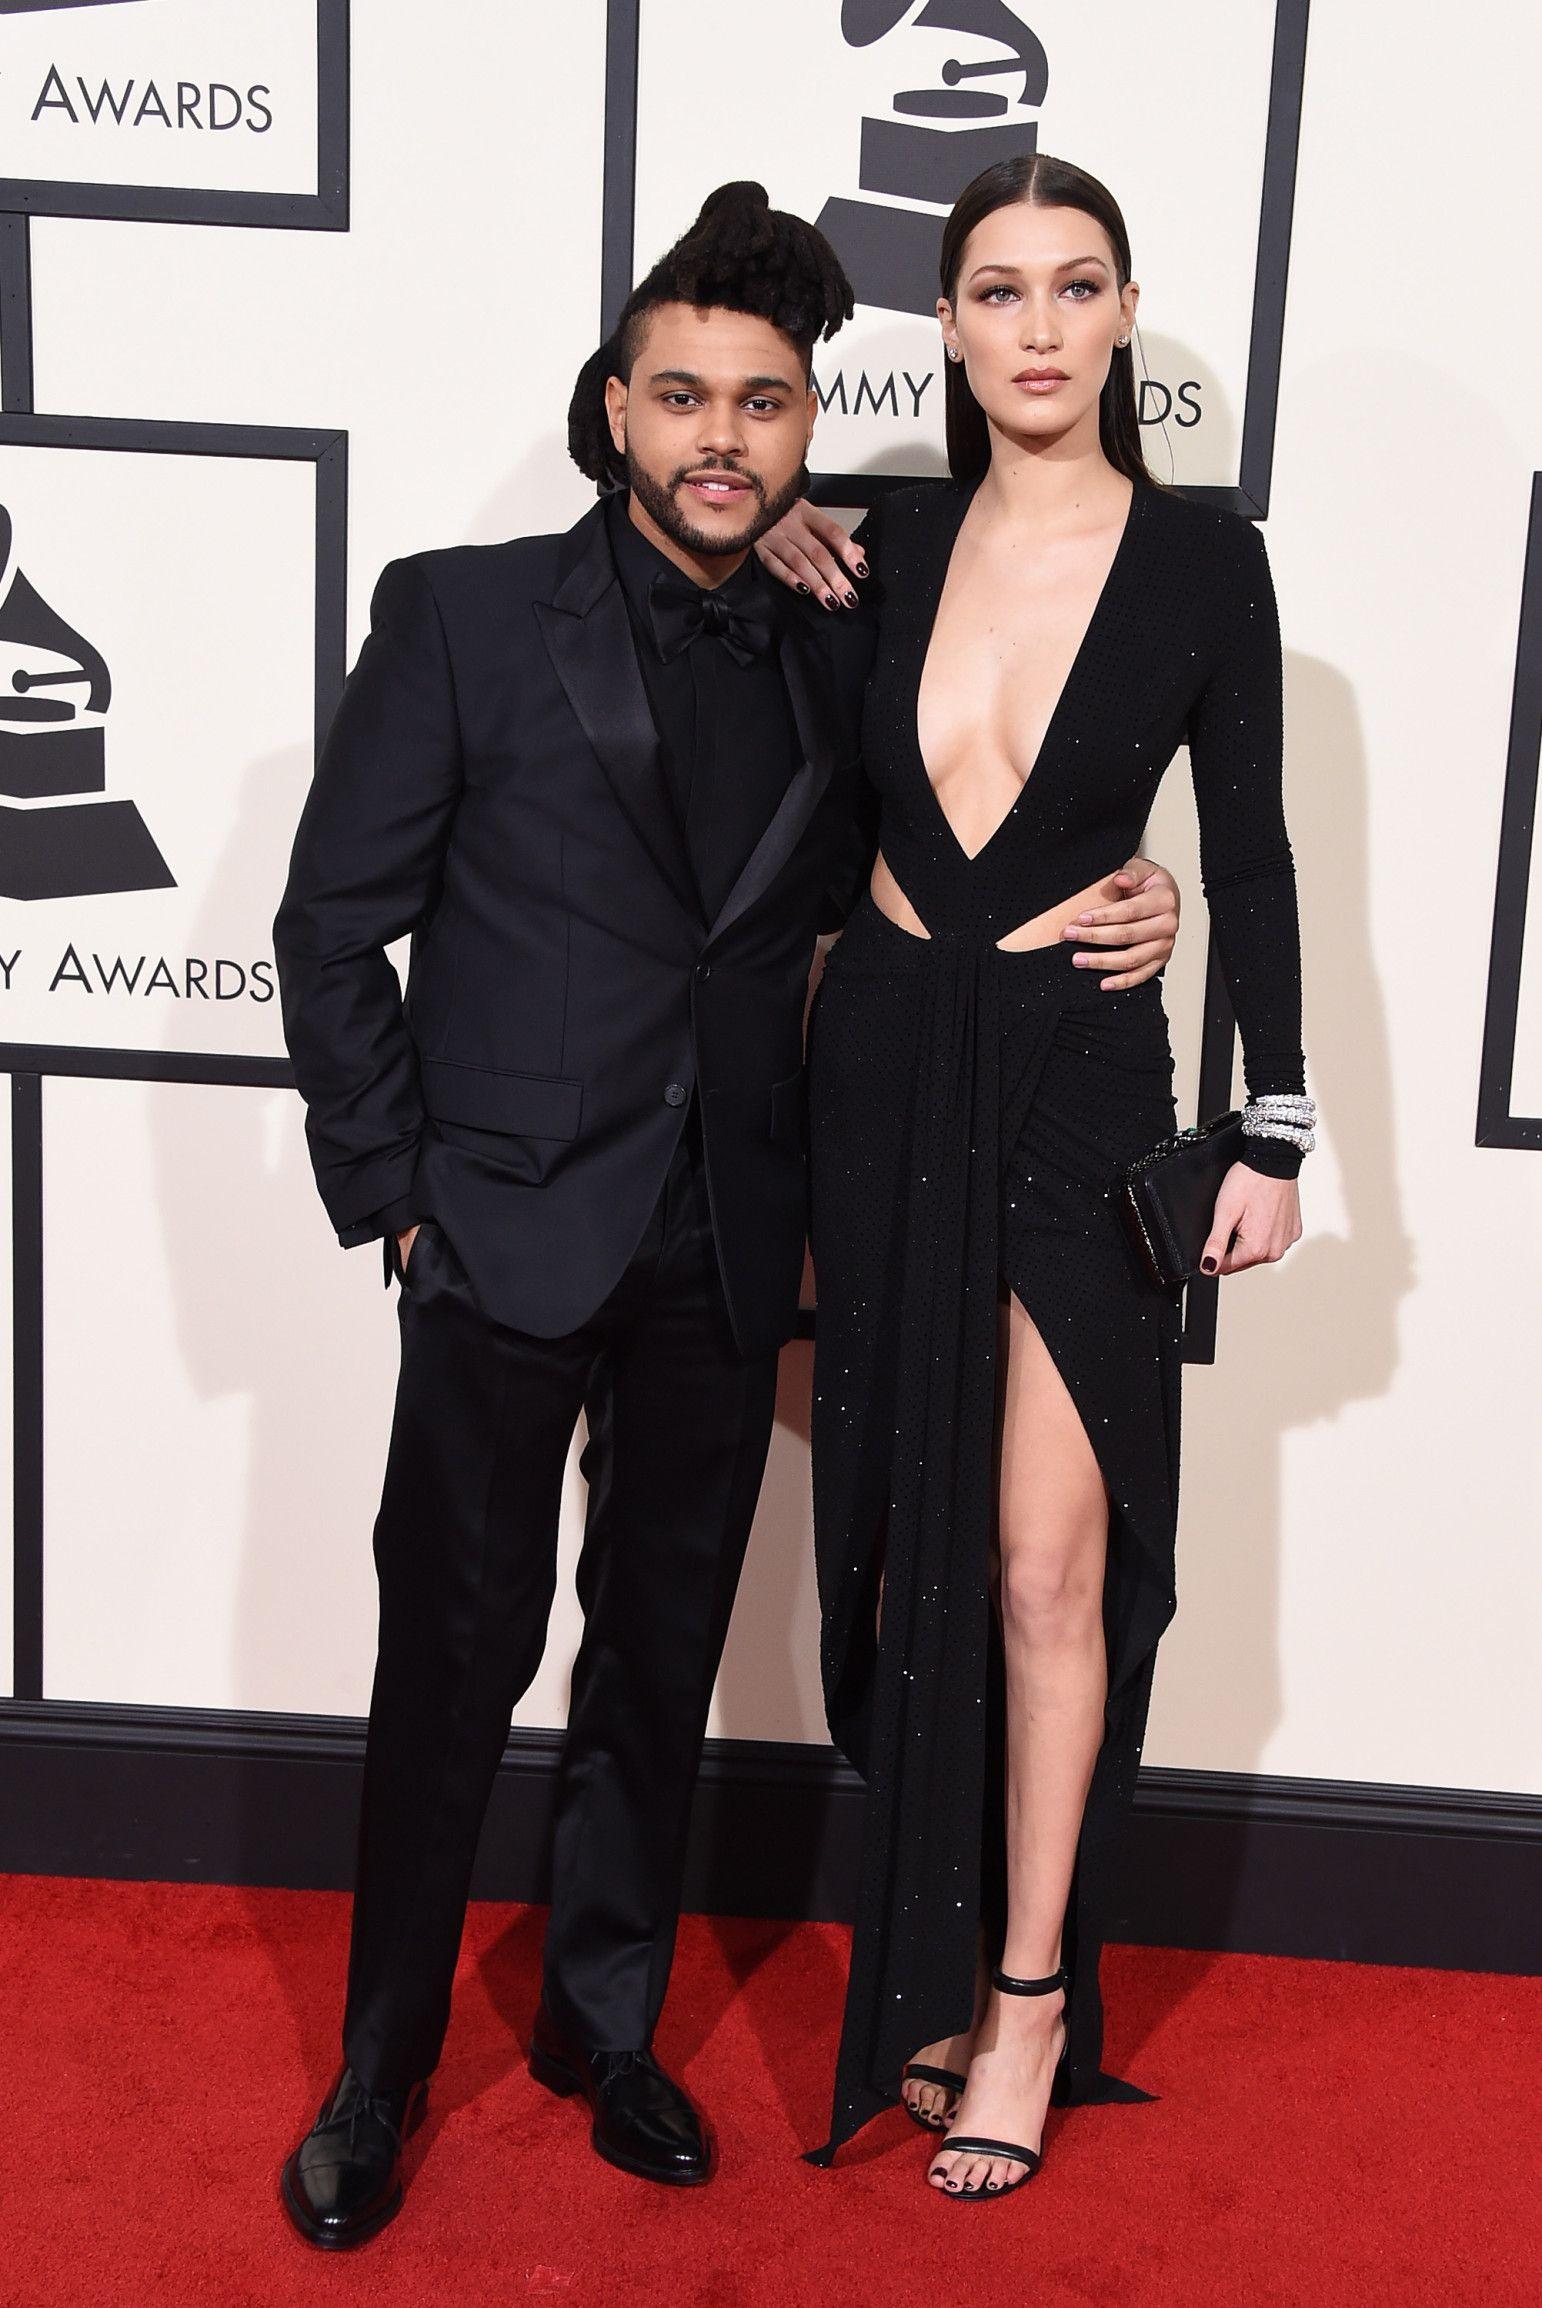 Grammy Awards 2016: Best Dressed on the Red Carpet - -Wmag